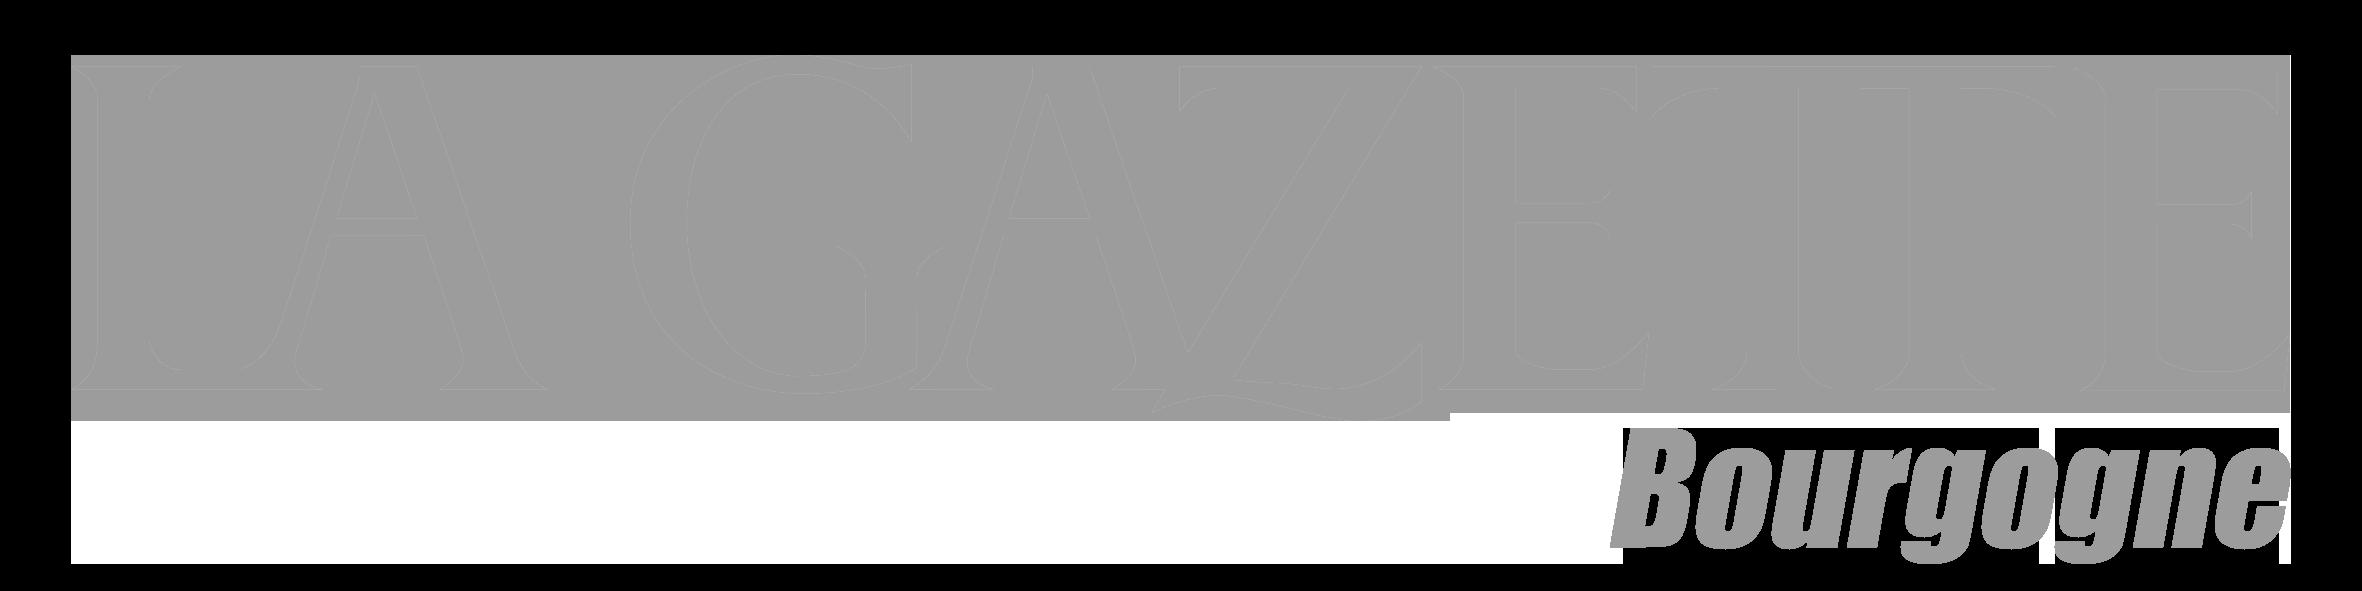 La Gazette Bourgogne